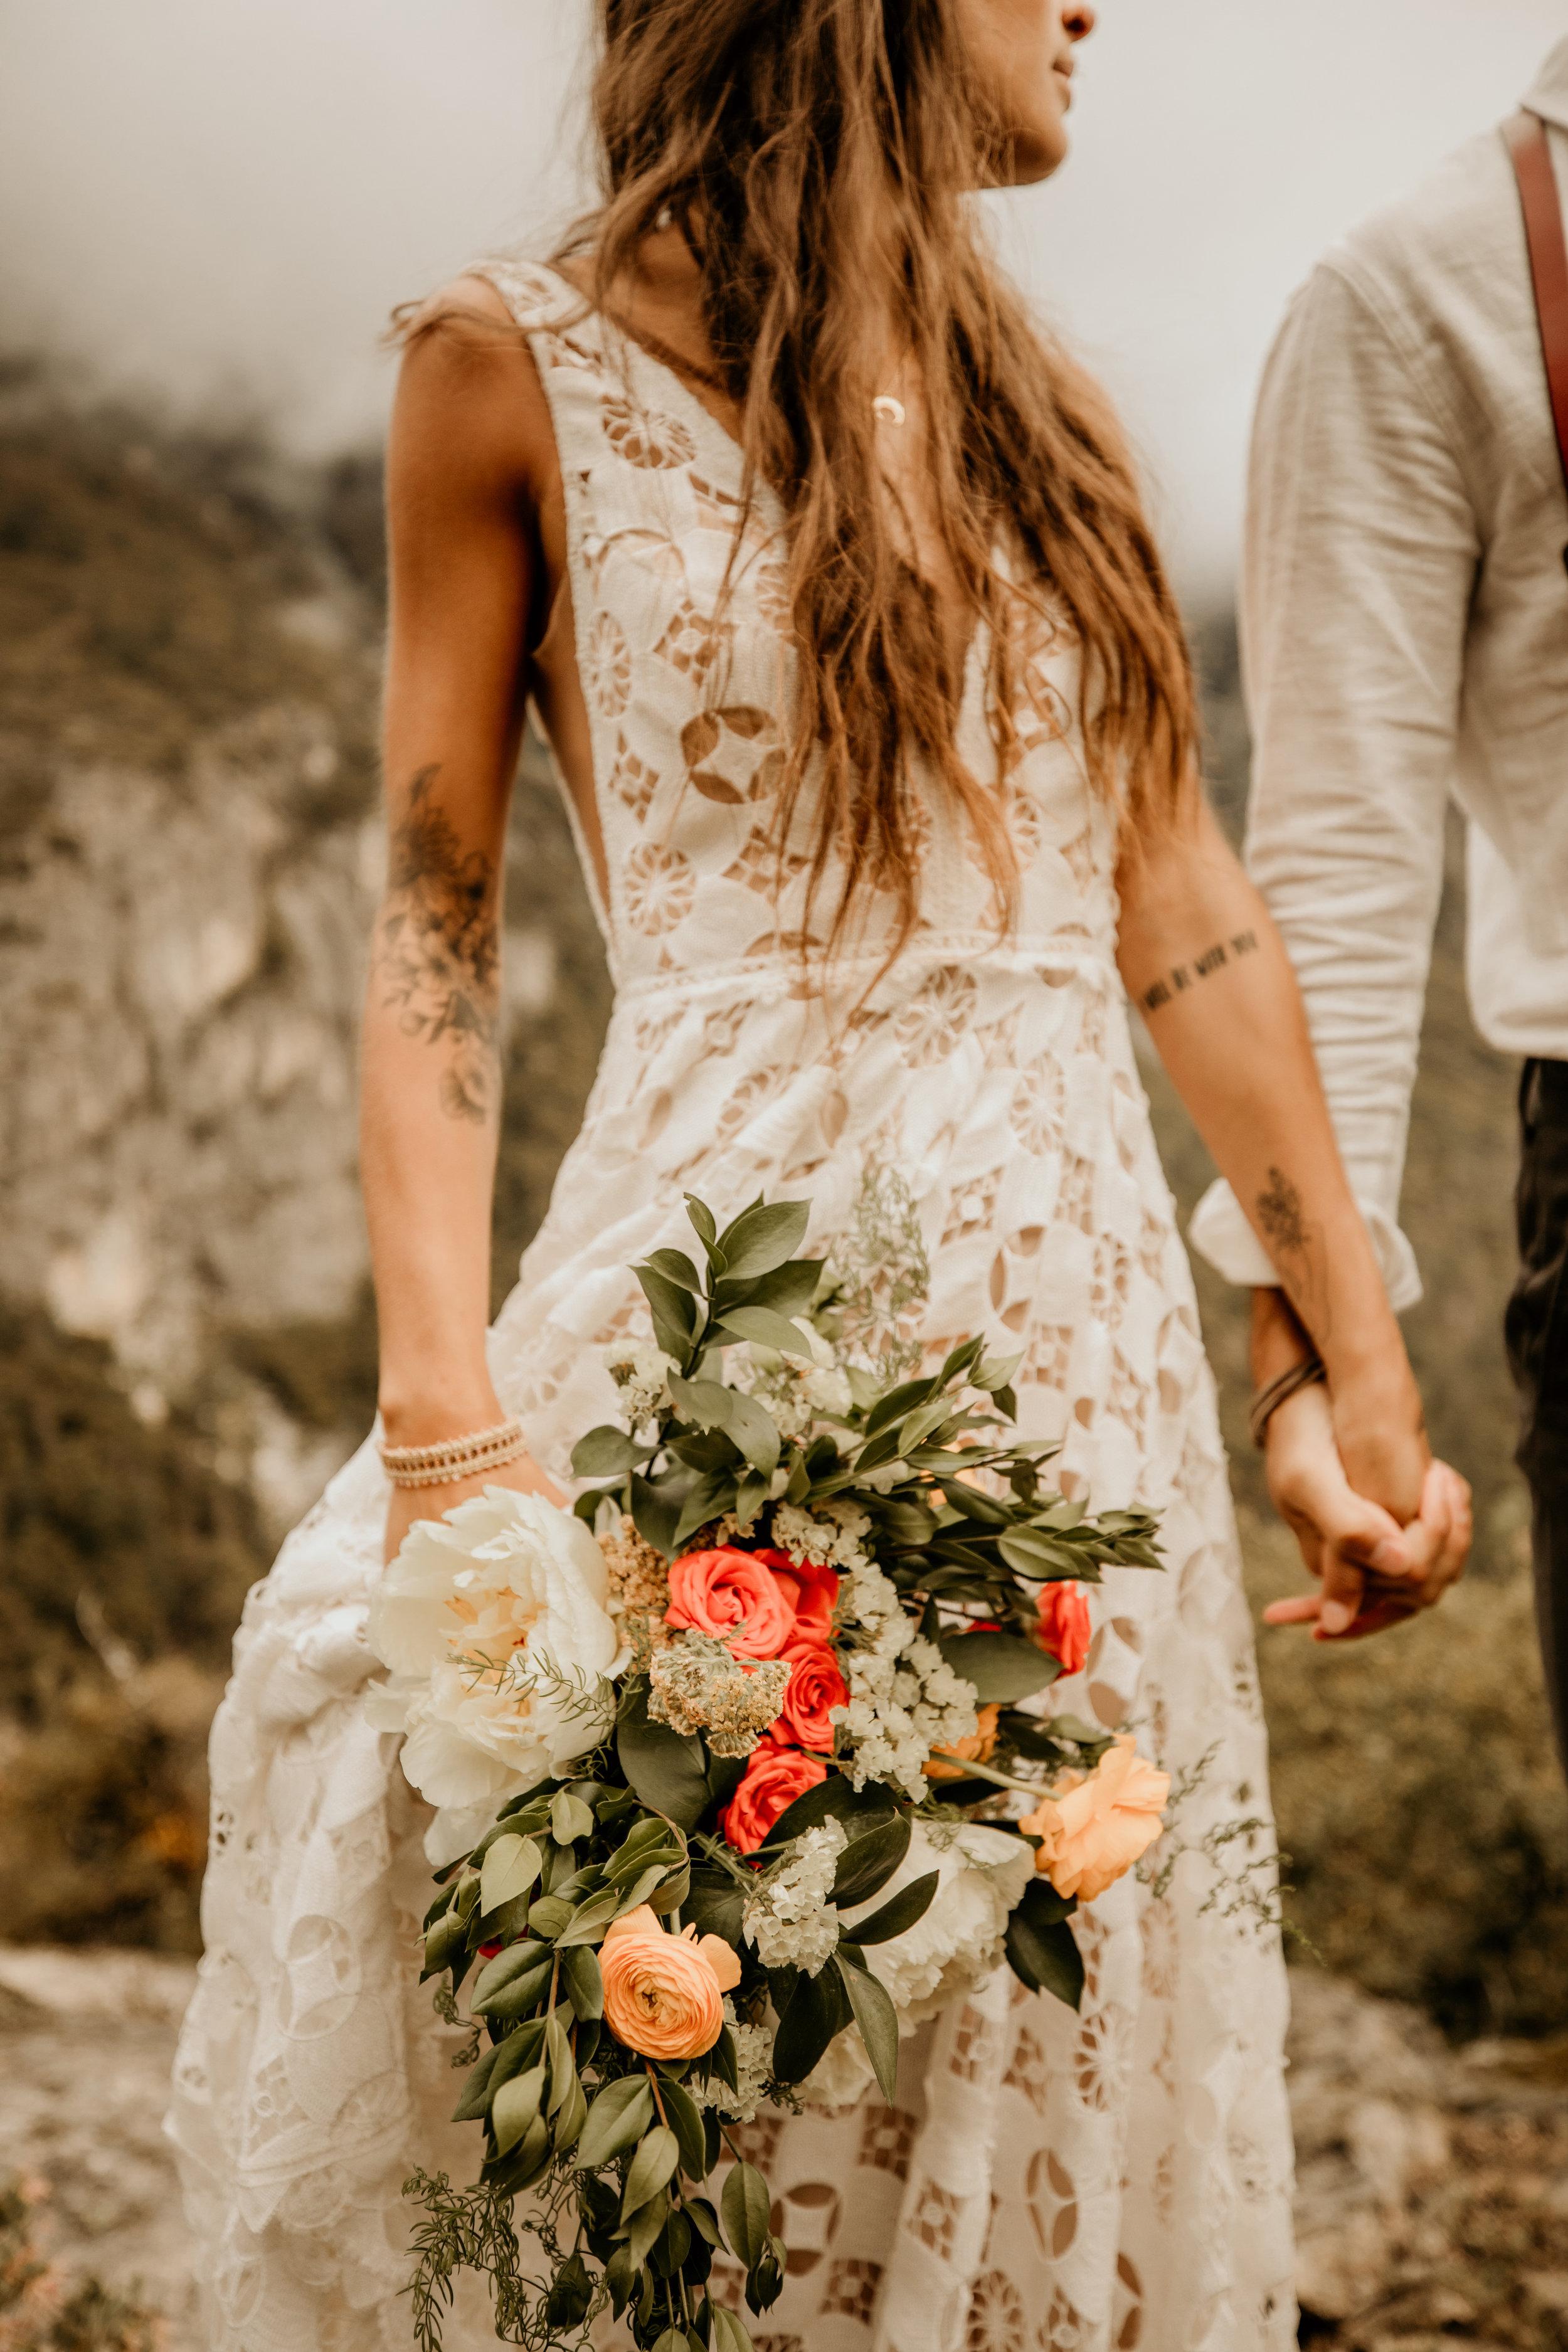 couples-engagement-outdoor-tatoo-photoshoot-little-rock-arkansas-4273-2.jpg